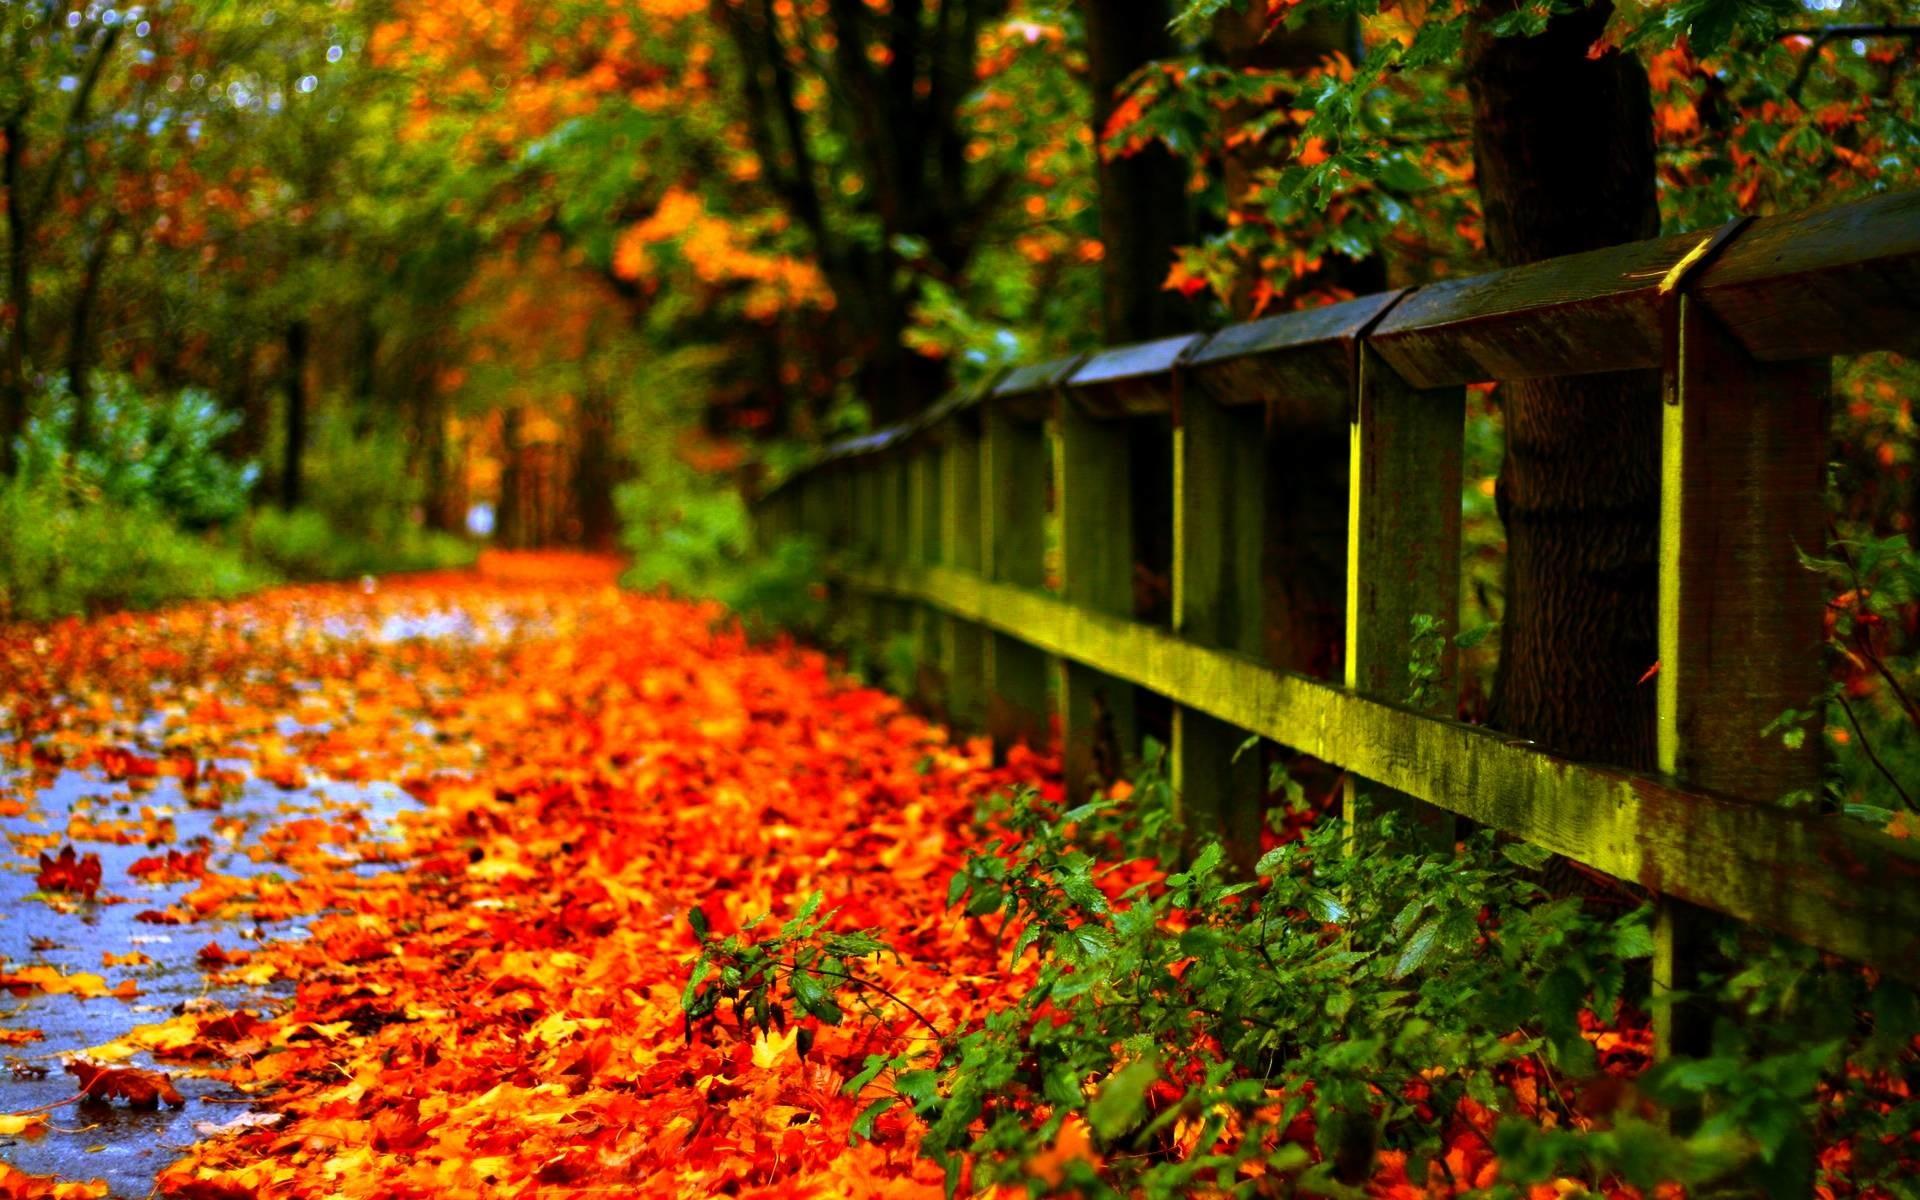 Autumn 2017 Leaves Wallpaper HD 1 …